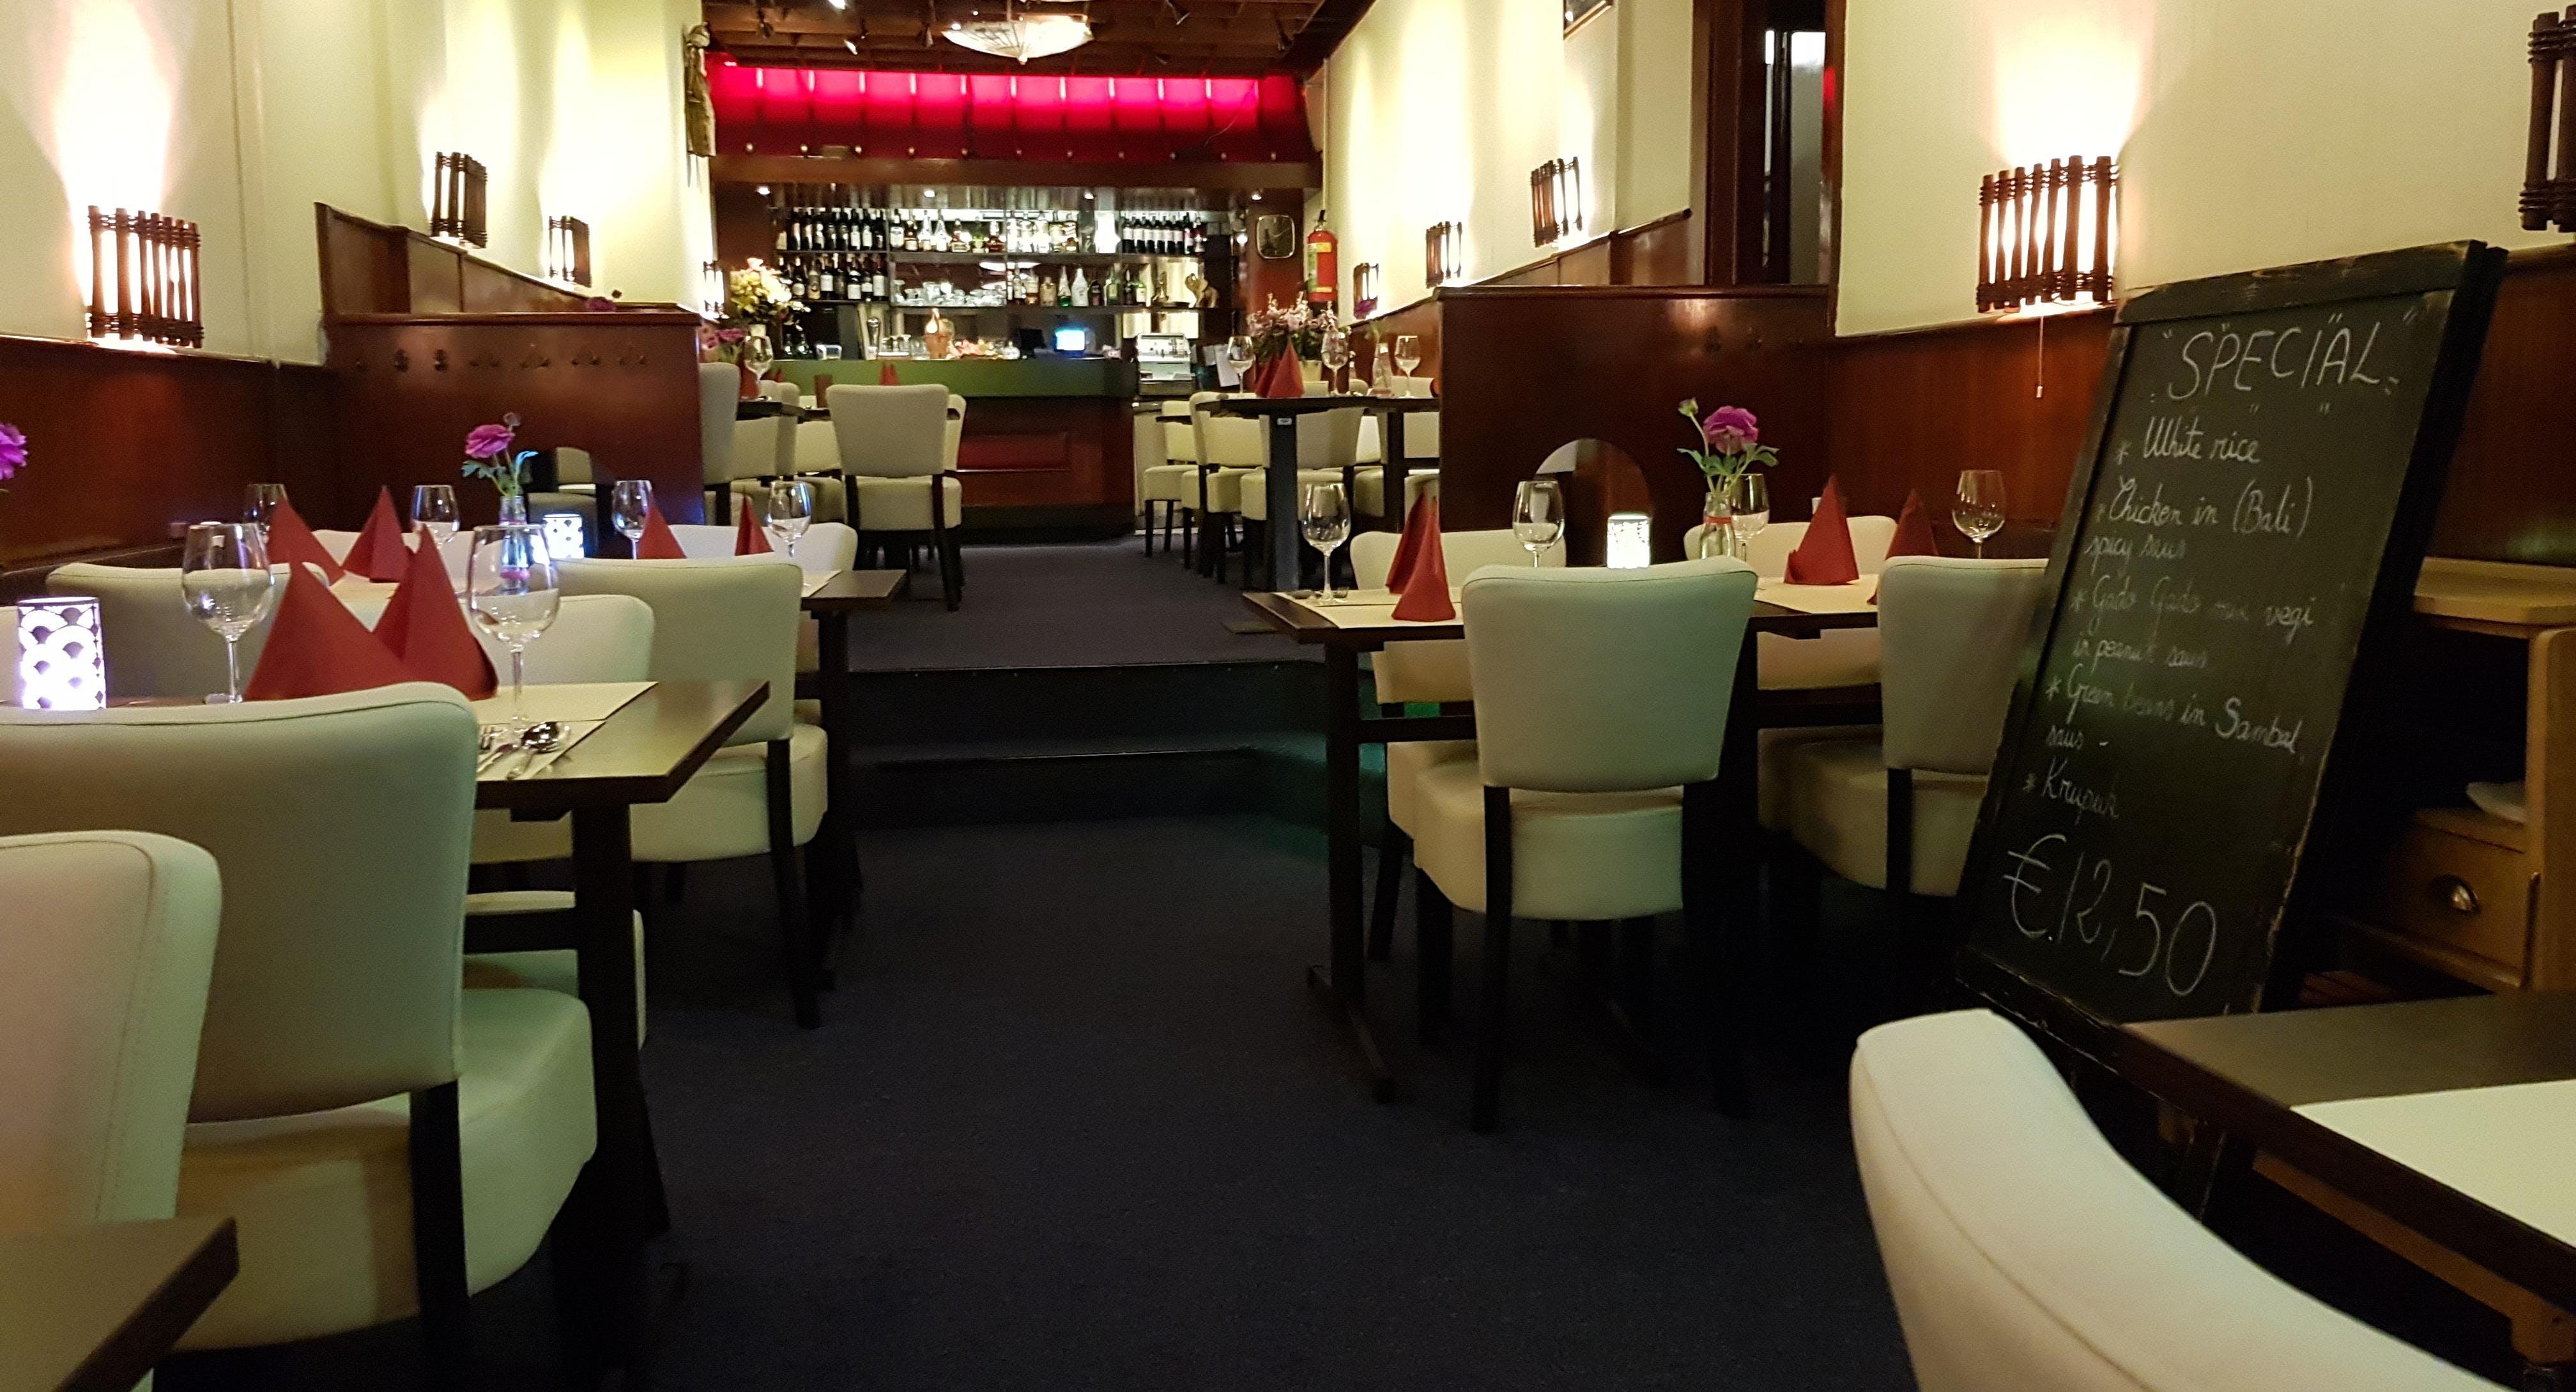 Restaurant Sita Djanoko Amsterdam image 2